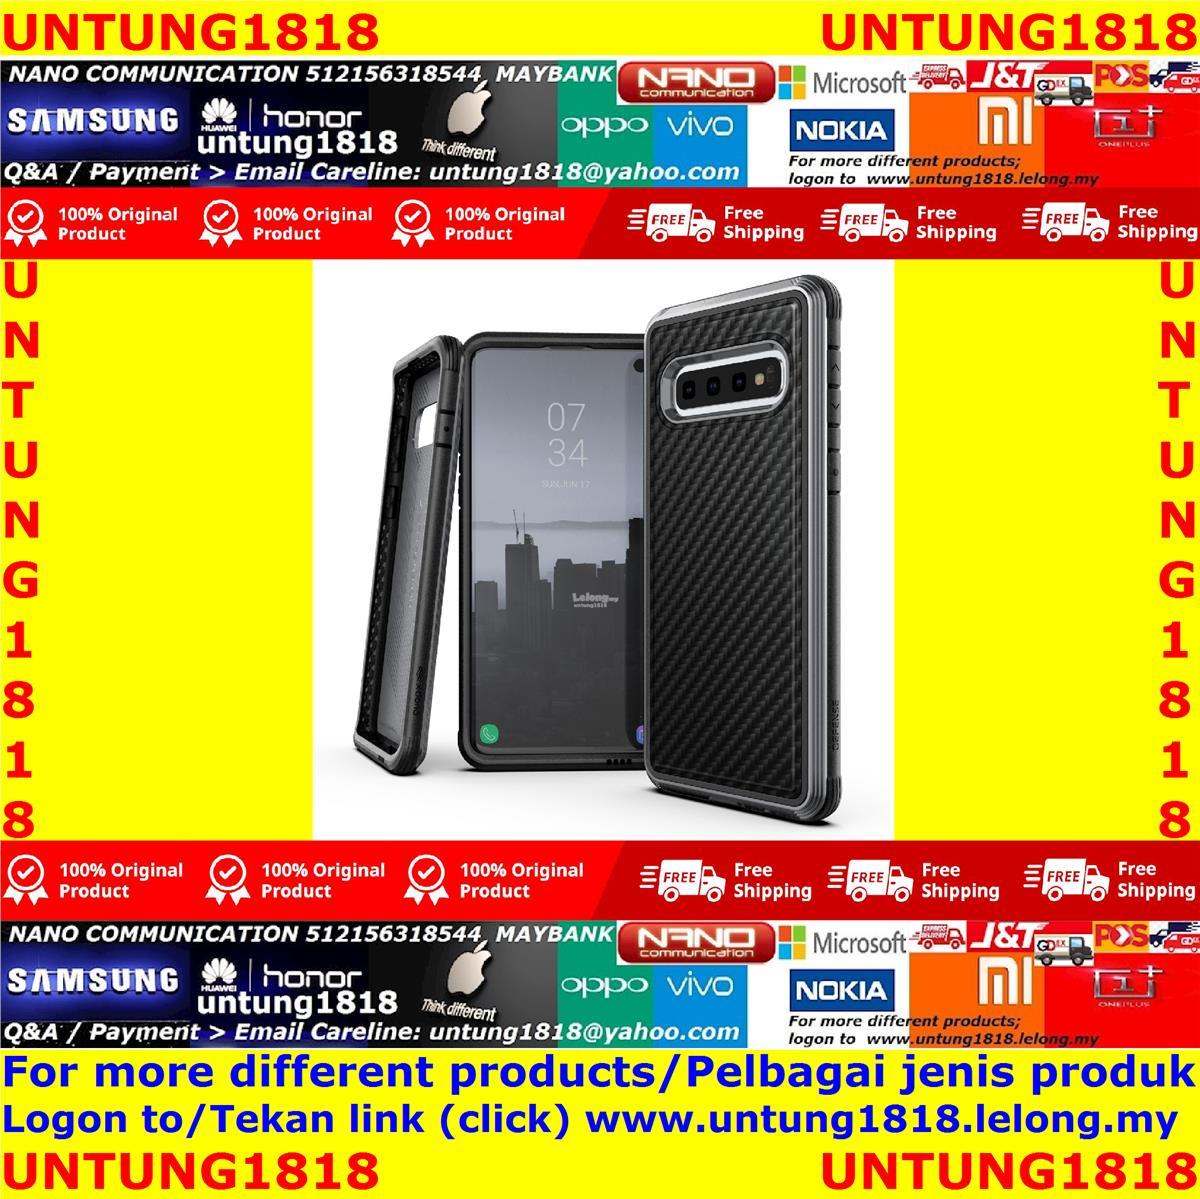 Samsung Galaxy S10 More Accessories Choice*